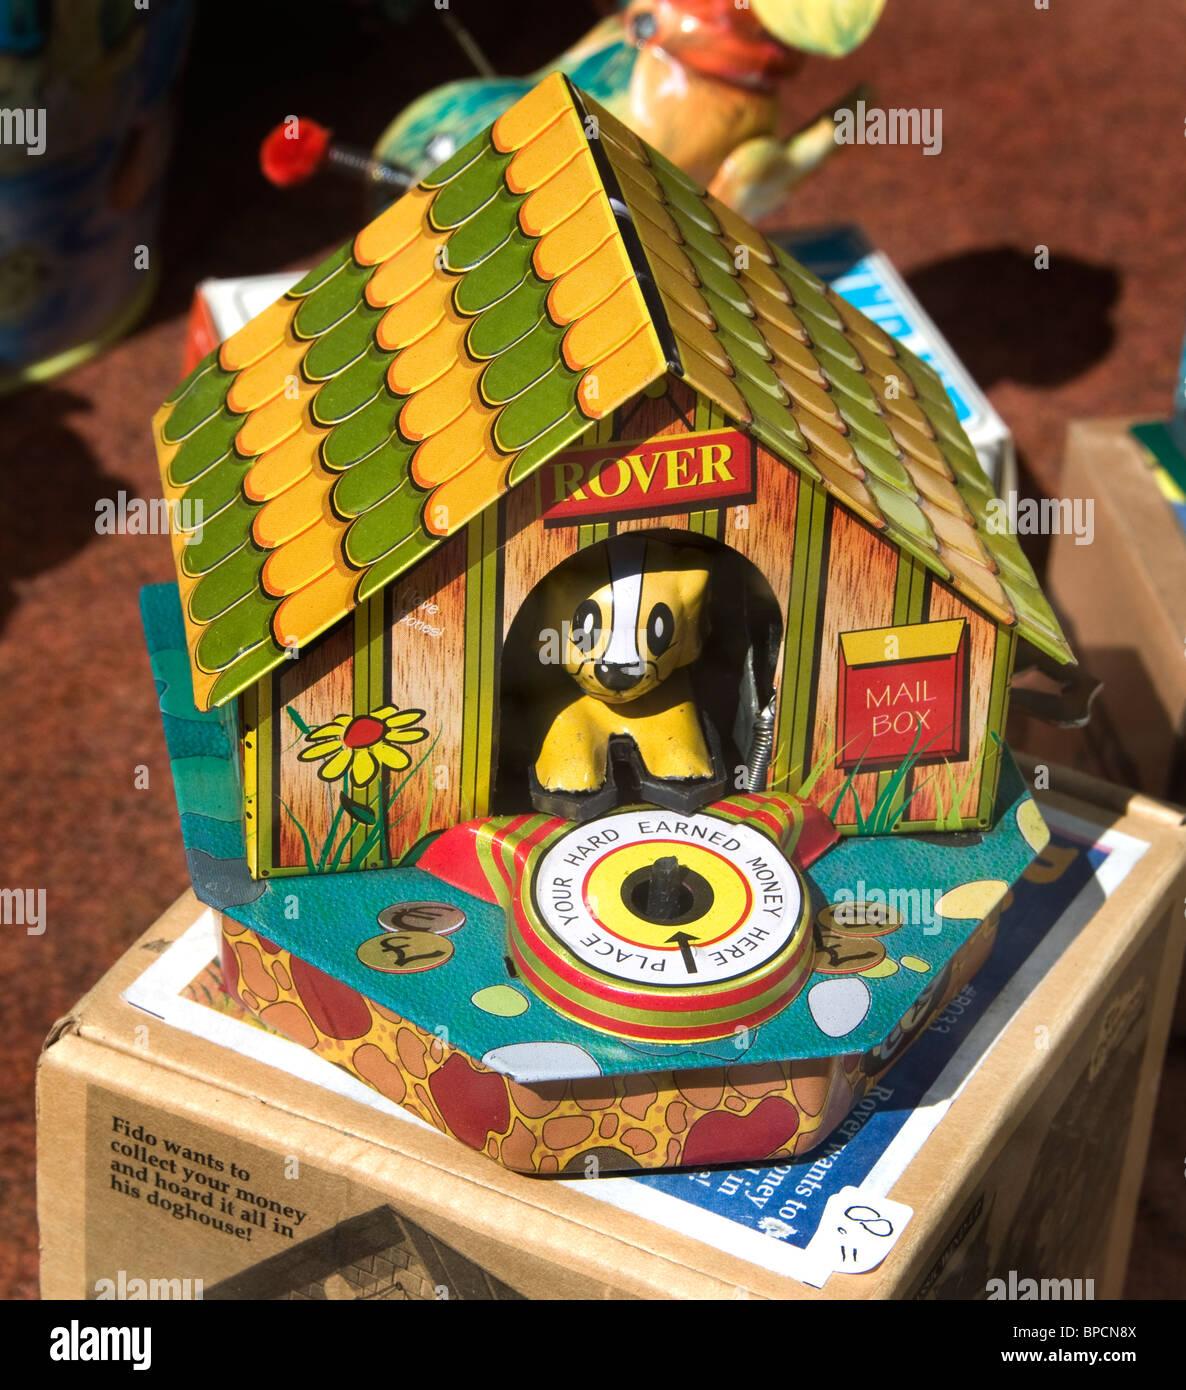 Rover Hundehaus Spielzeug Kinder Spielzeug Kind Stockbild